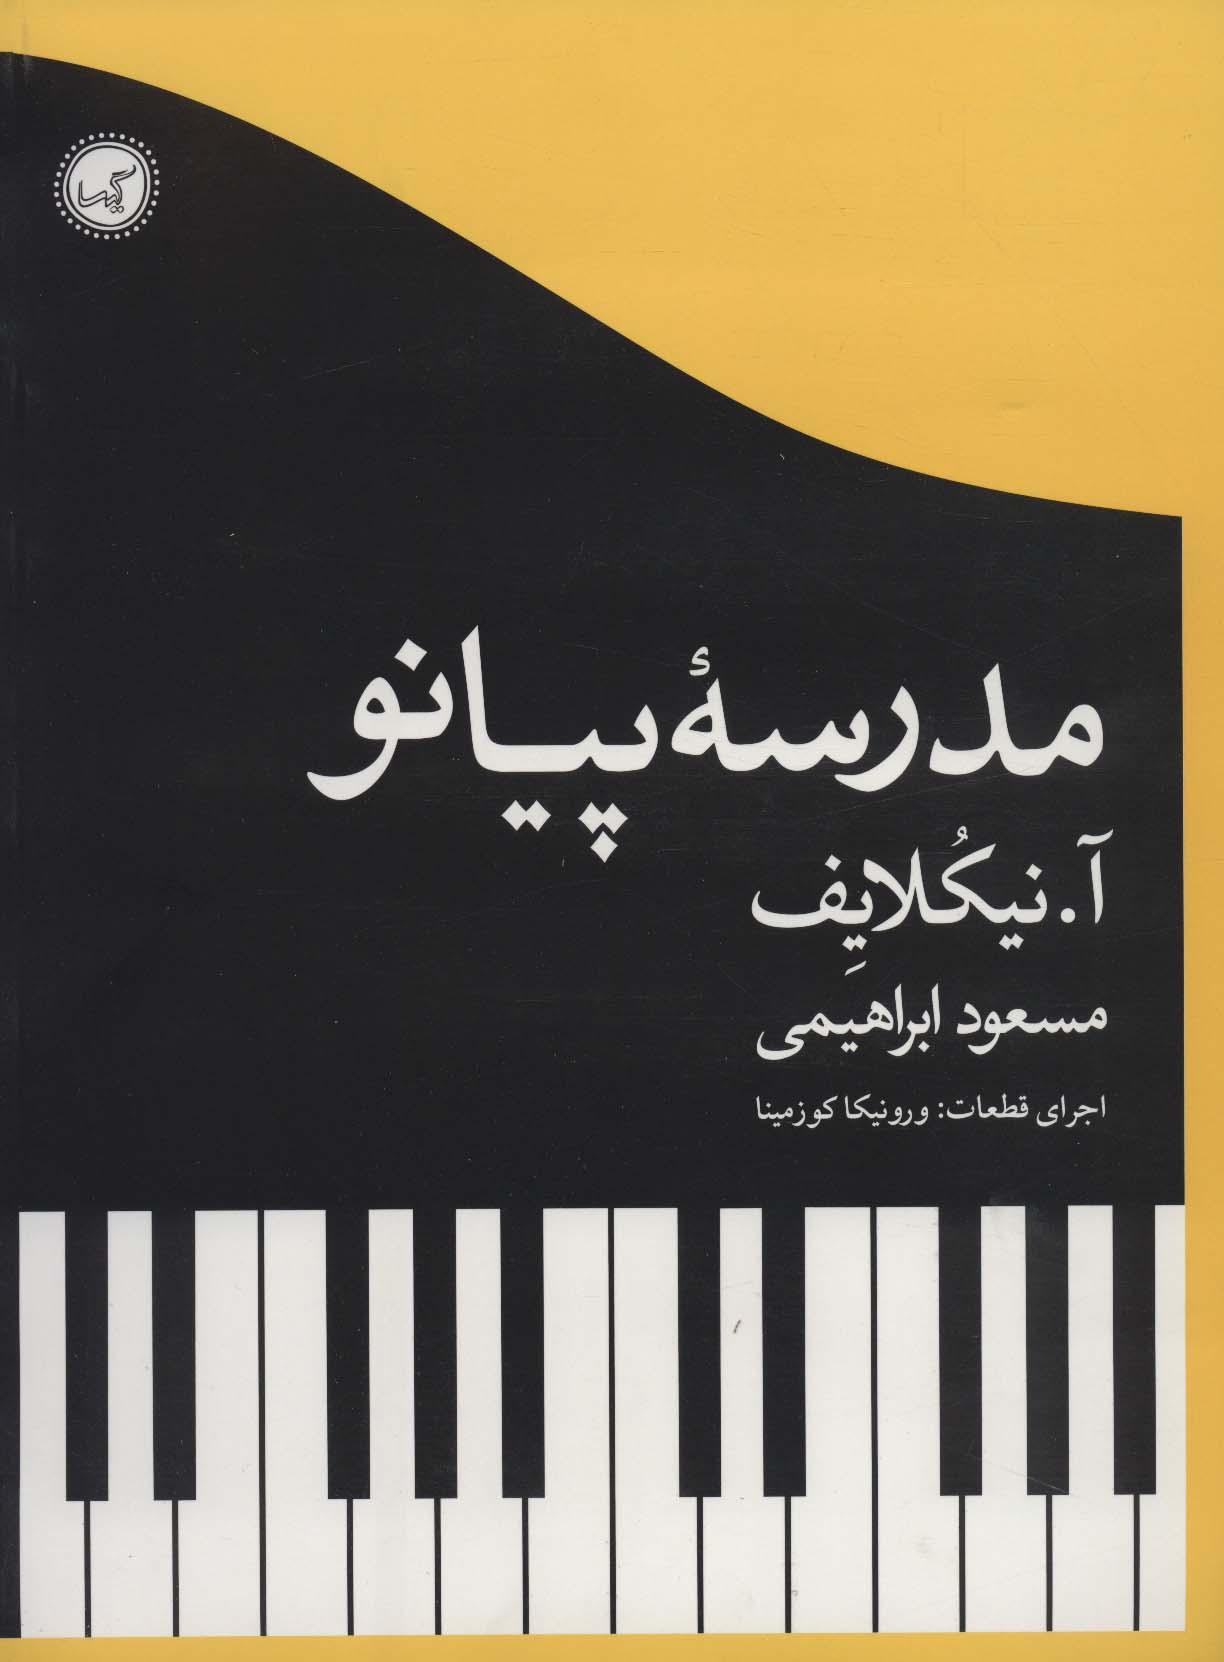 مدرسه پیانو (موسیقی11)